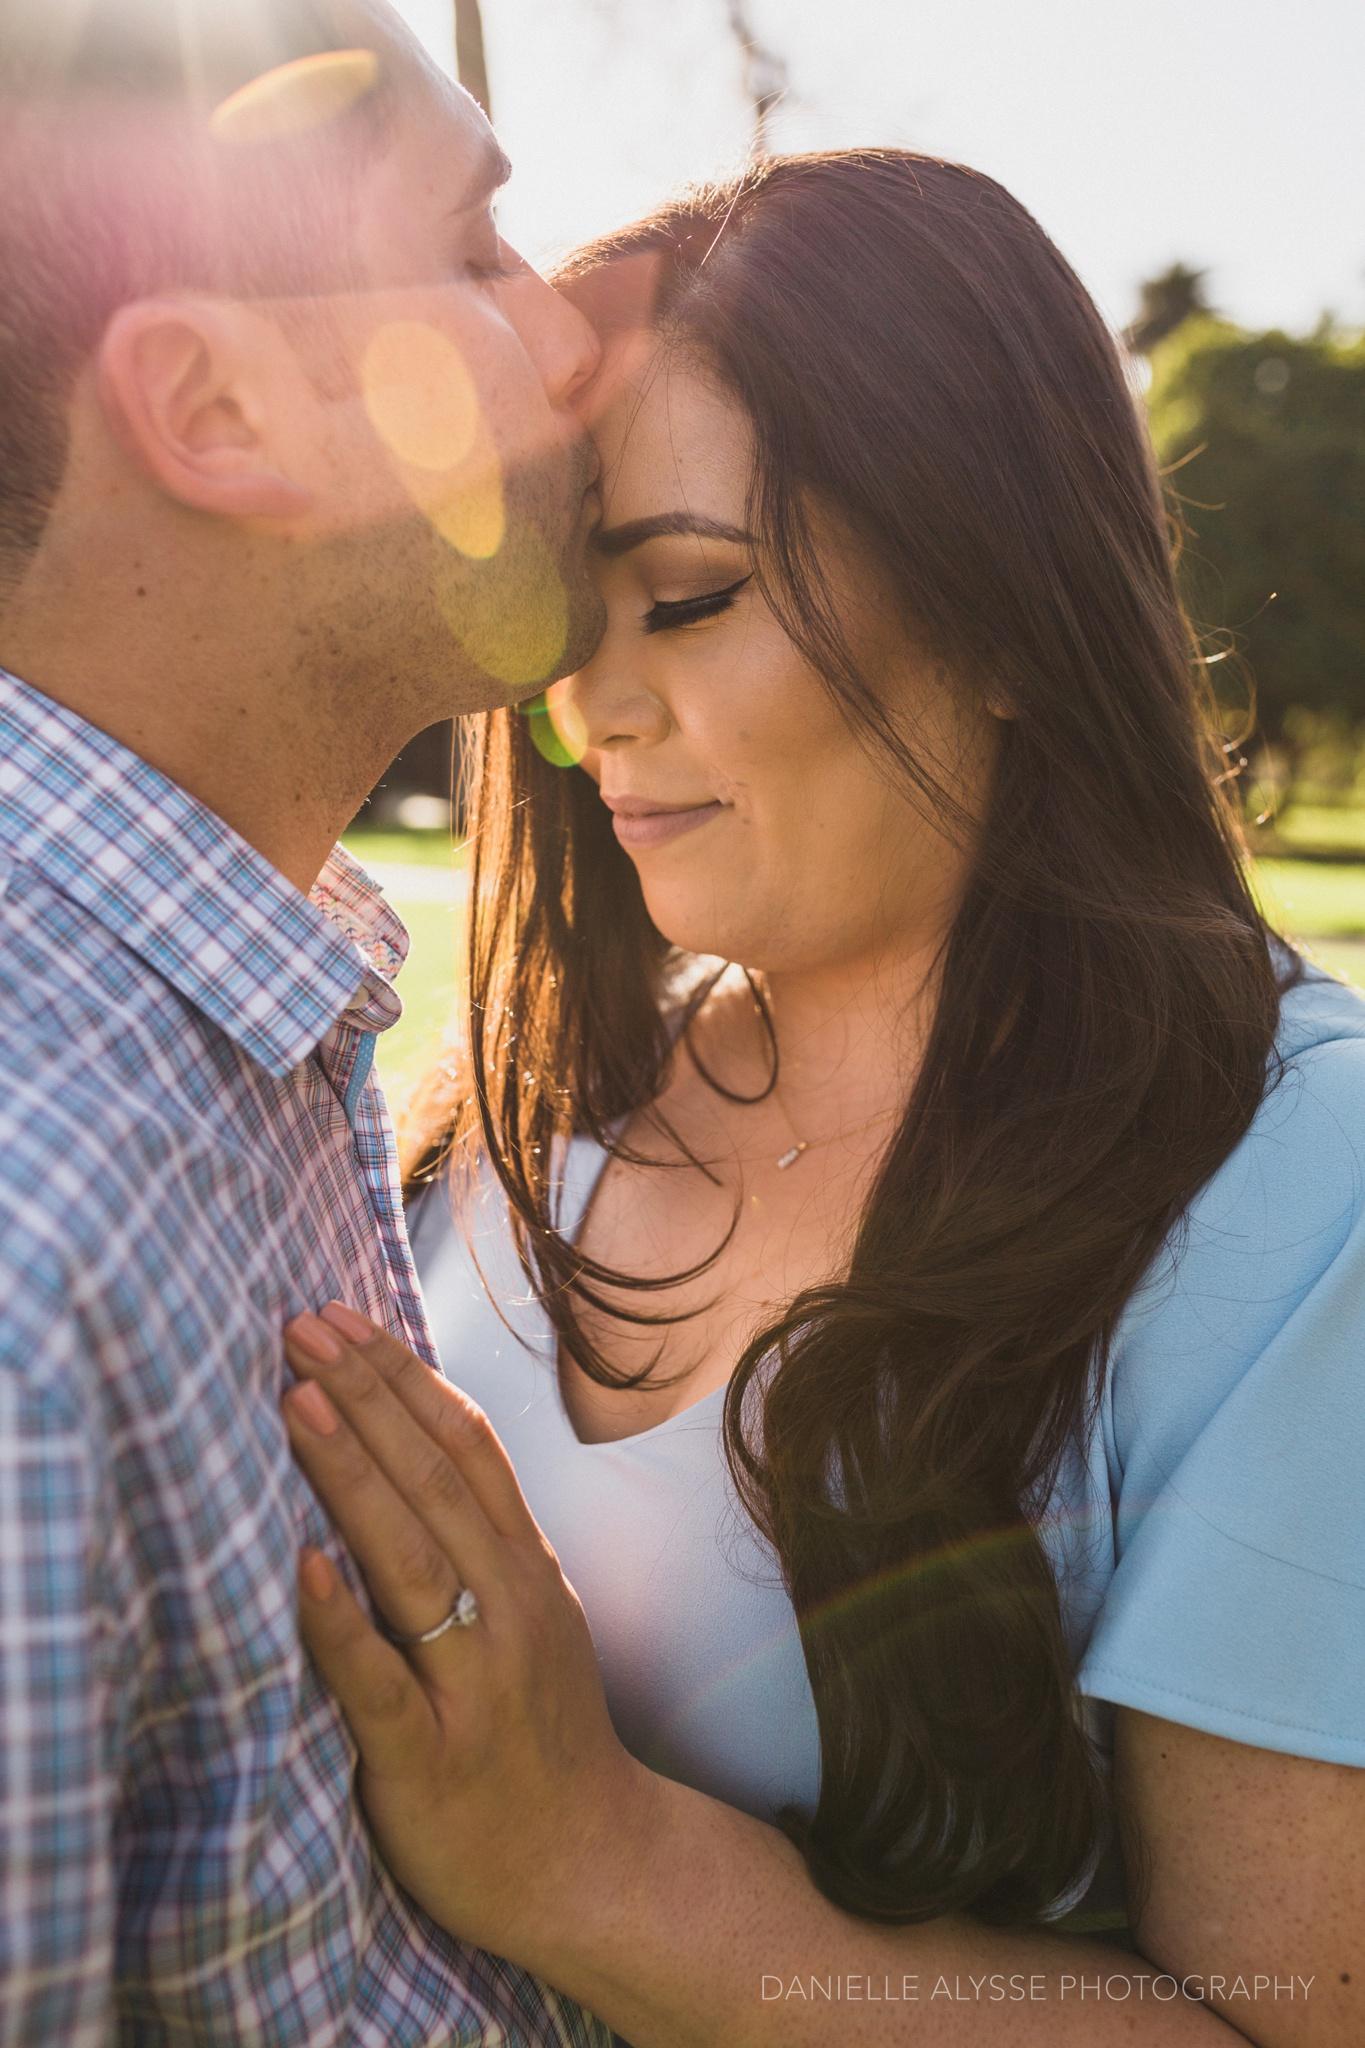 180324_engagement_lily_danielle_alysse_photography_downtown_sacramento_wedding_photographer_blog_15_WEB.jpg